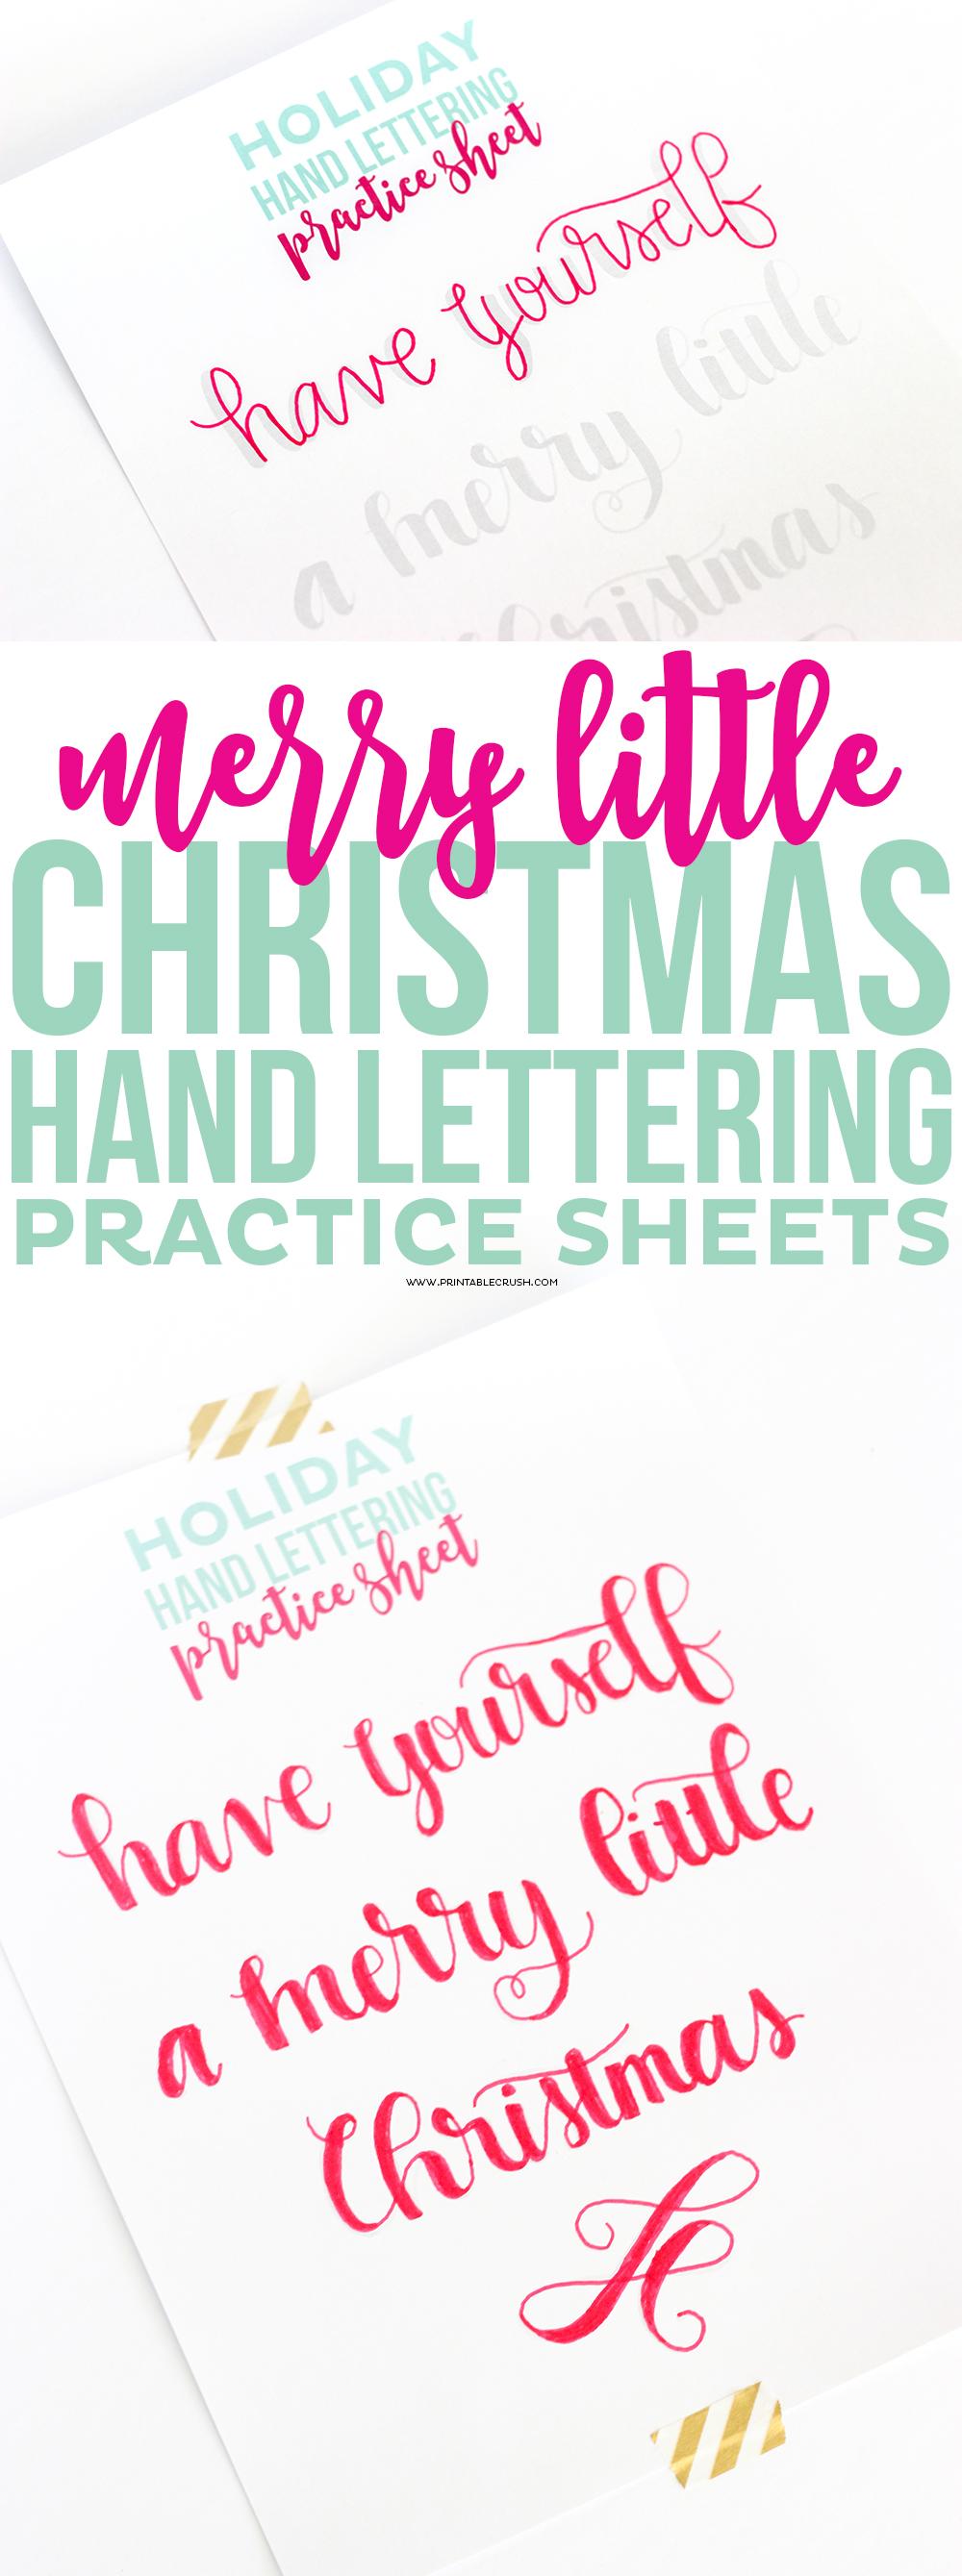 Handwriting help sheets